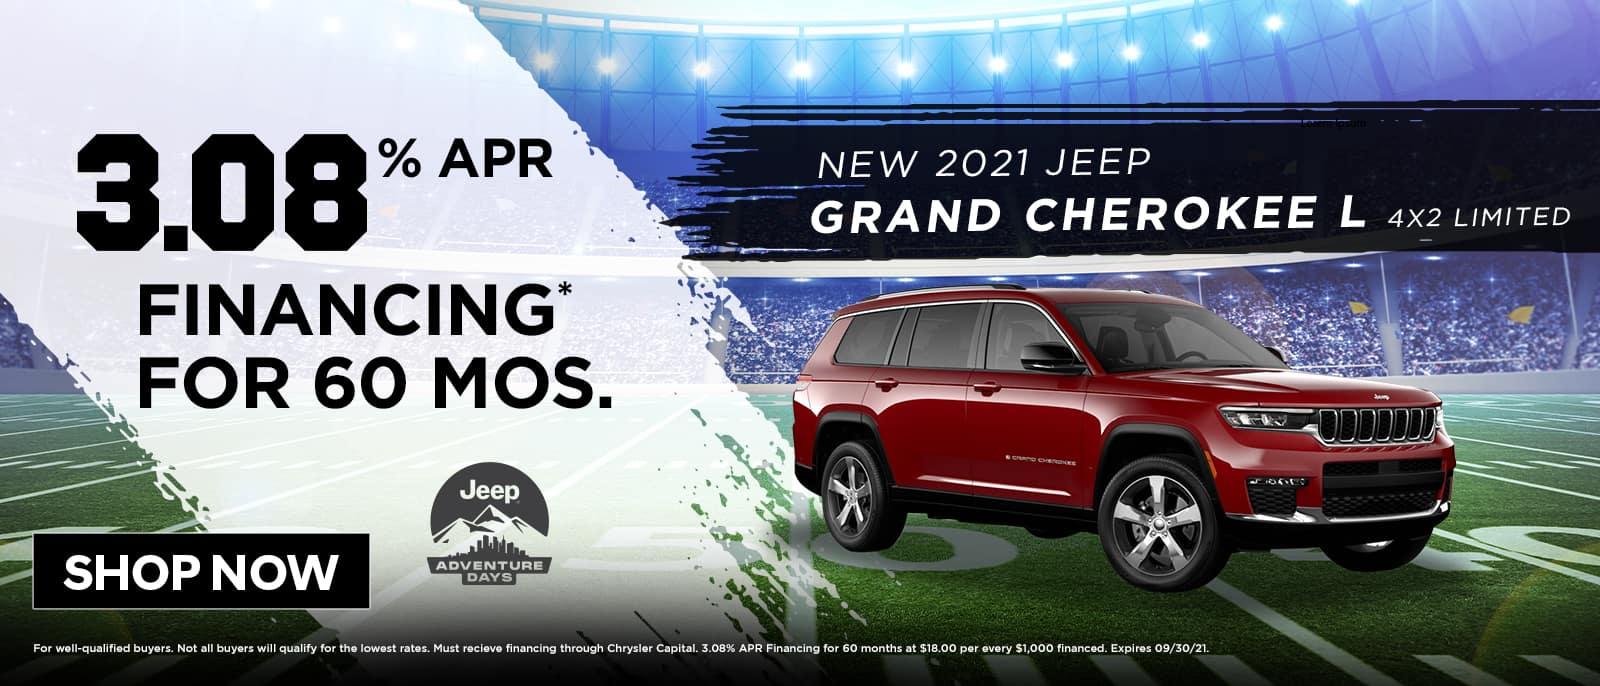 179-0921-SCO5095_Grand Cherokee